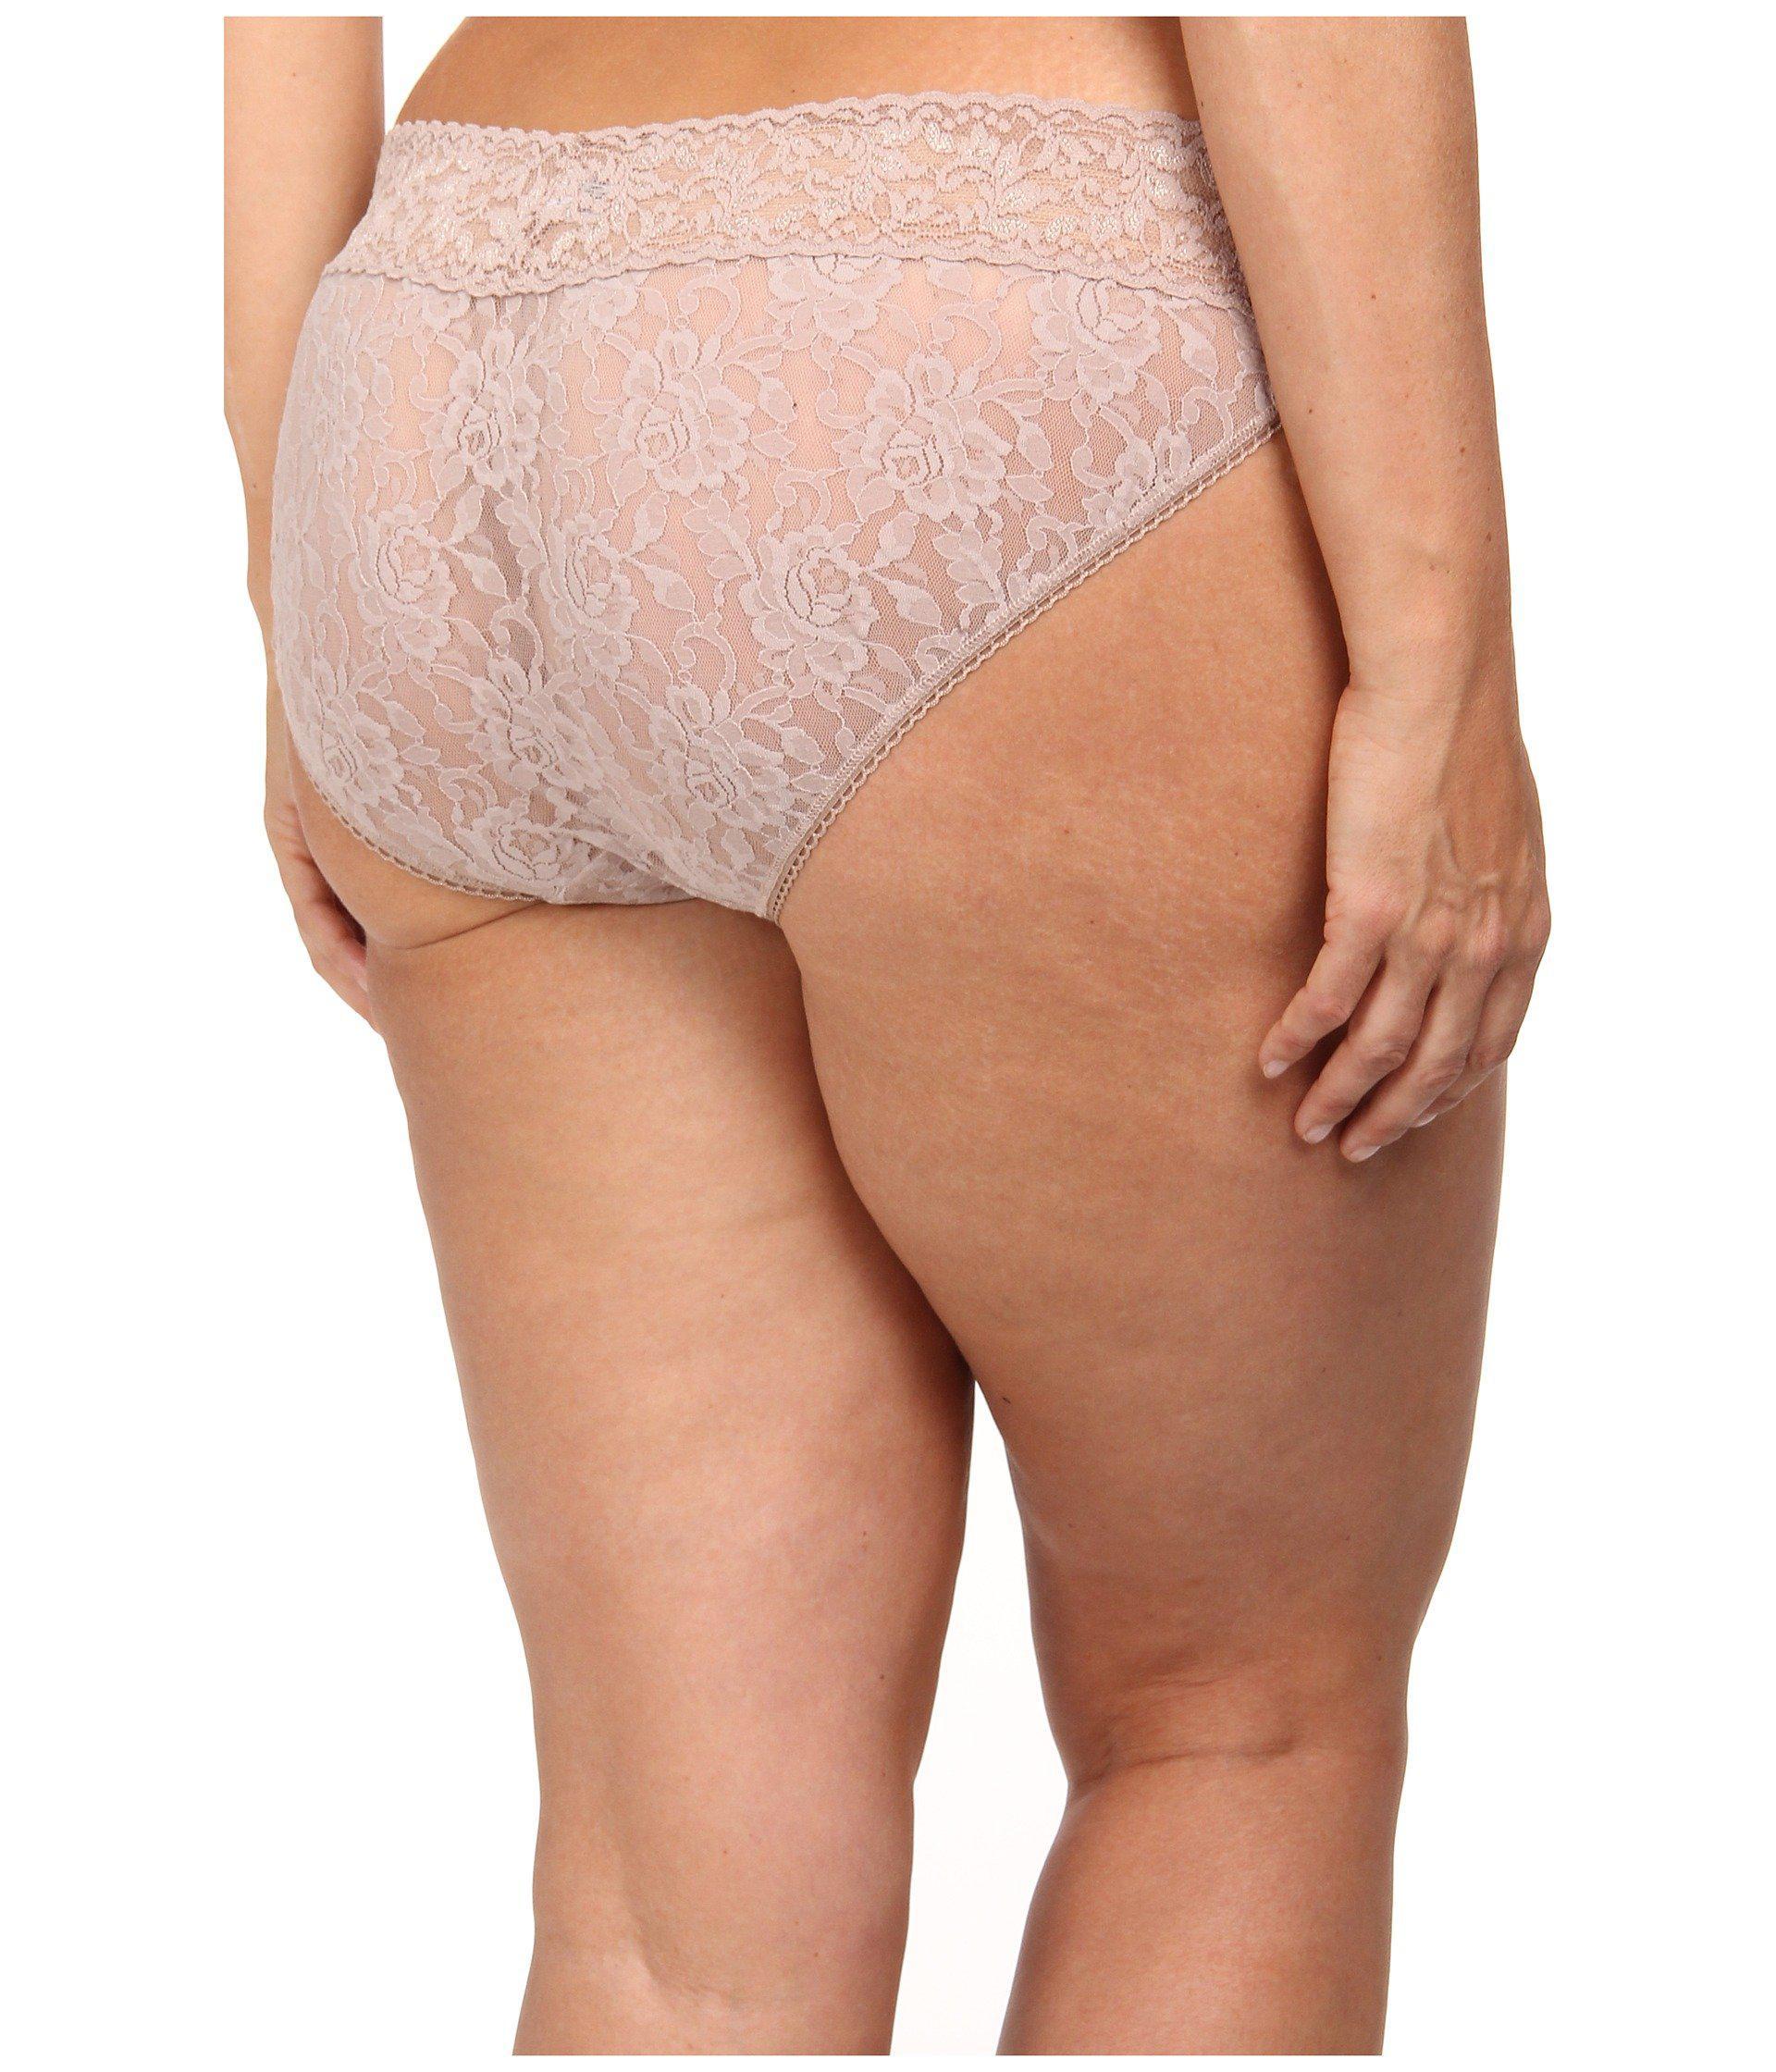 6ad0a05a7340 Lyst - Hanky Panky Plus Size Signature Lace V-kini (chai) Women's ...